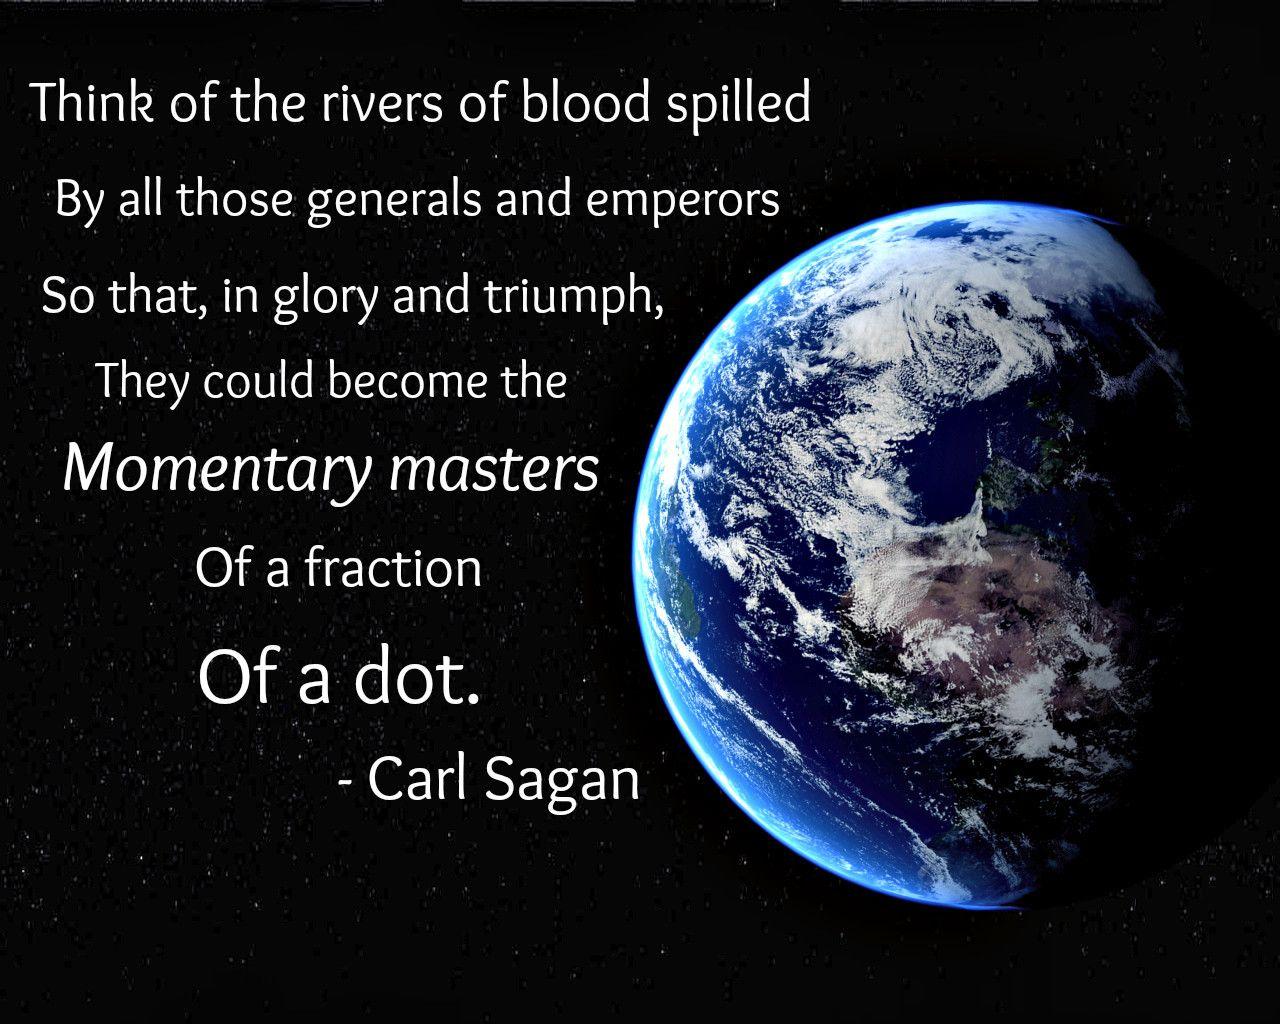 Carl Sagan Love Quote Pinedward Smith On 006 Carl Sagan  Pinterest  Carl Sagan